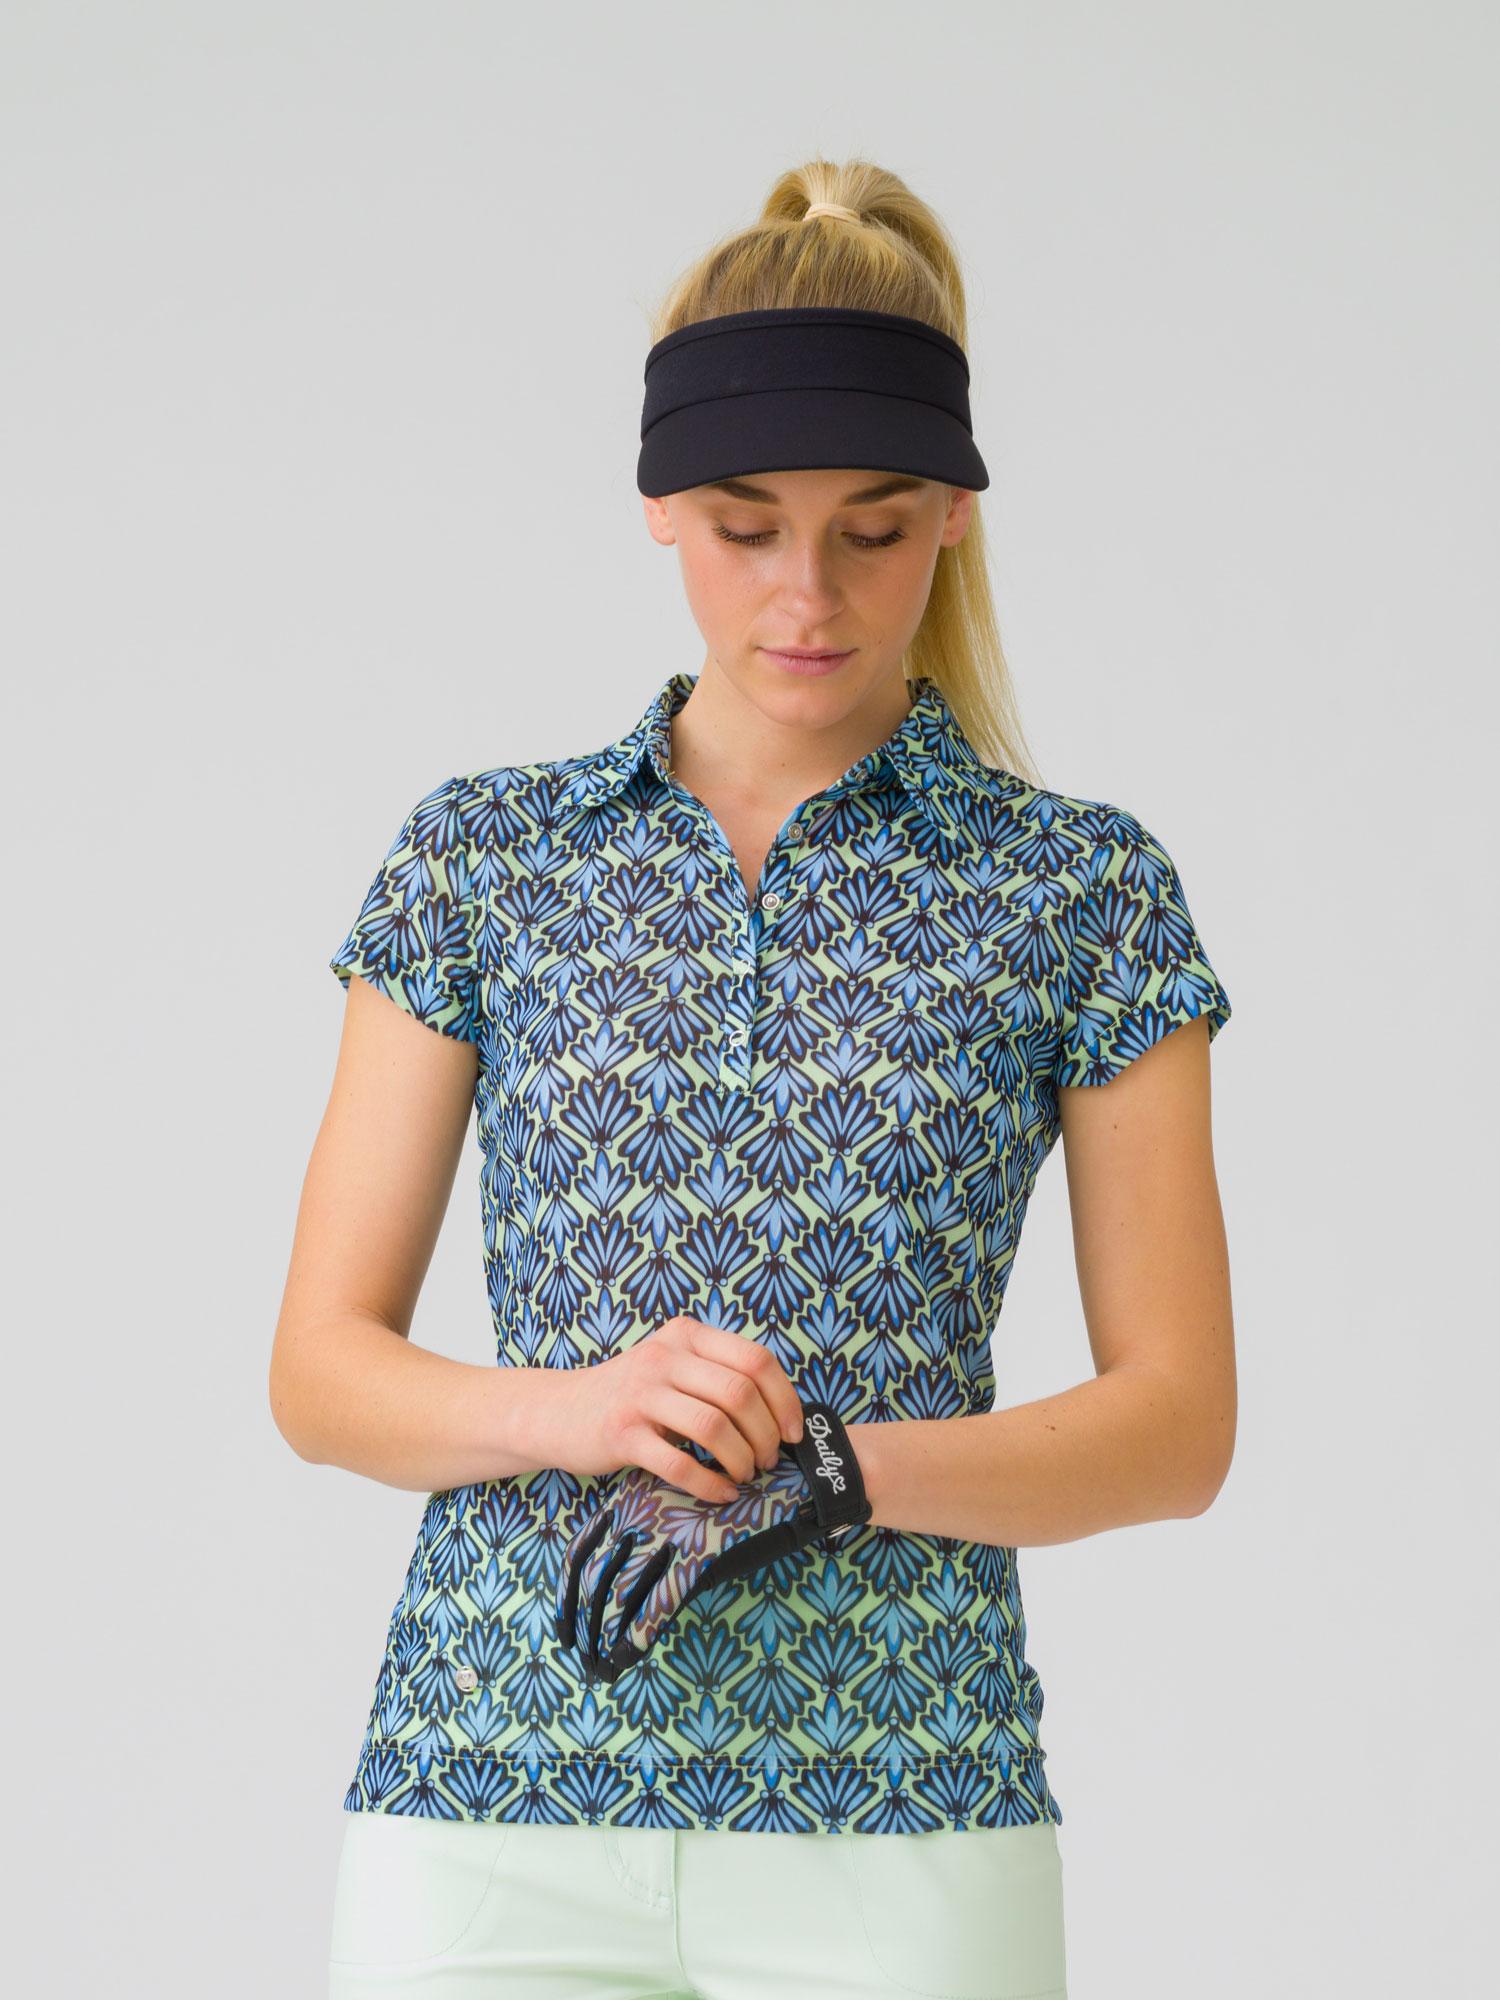 Kiley cap short-sleeved mesh polo shirt